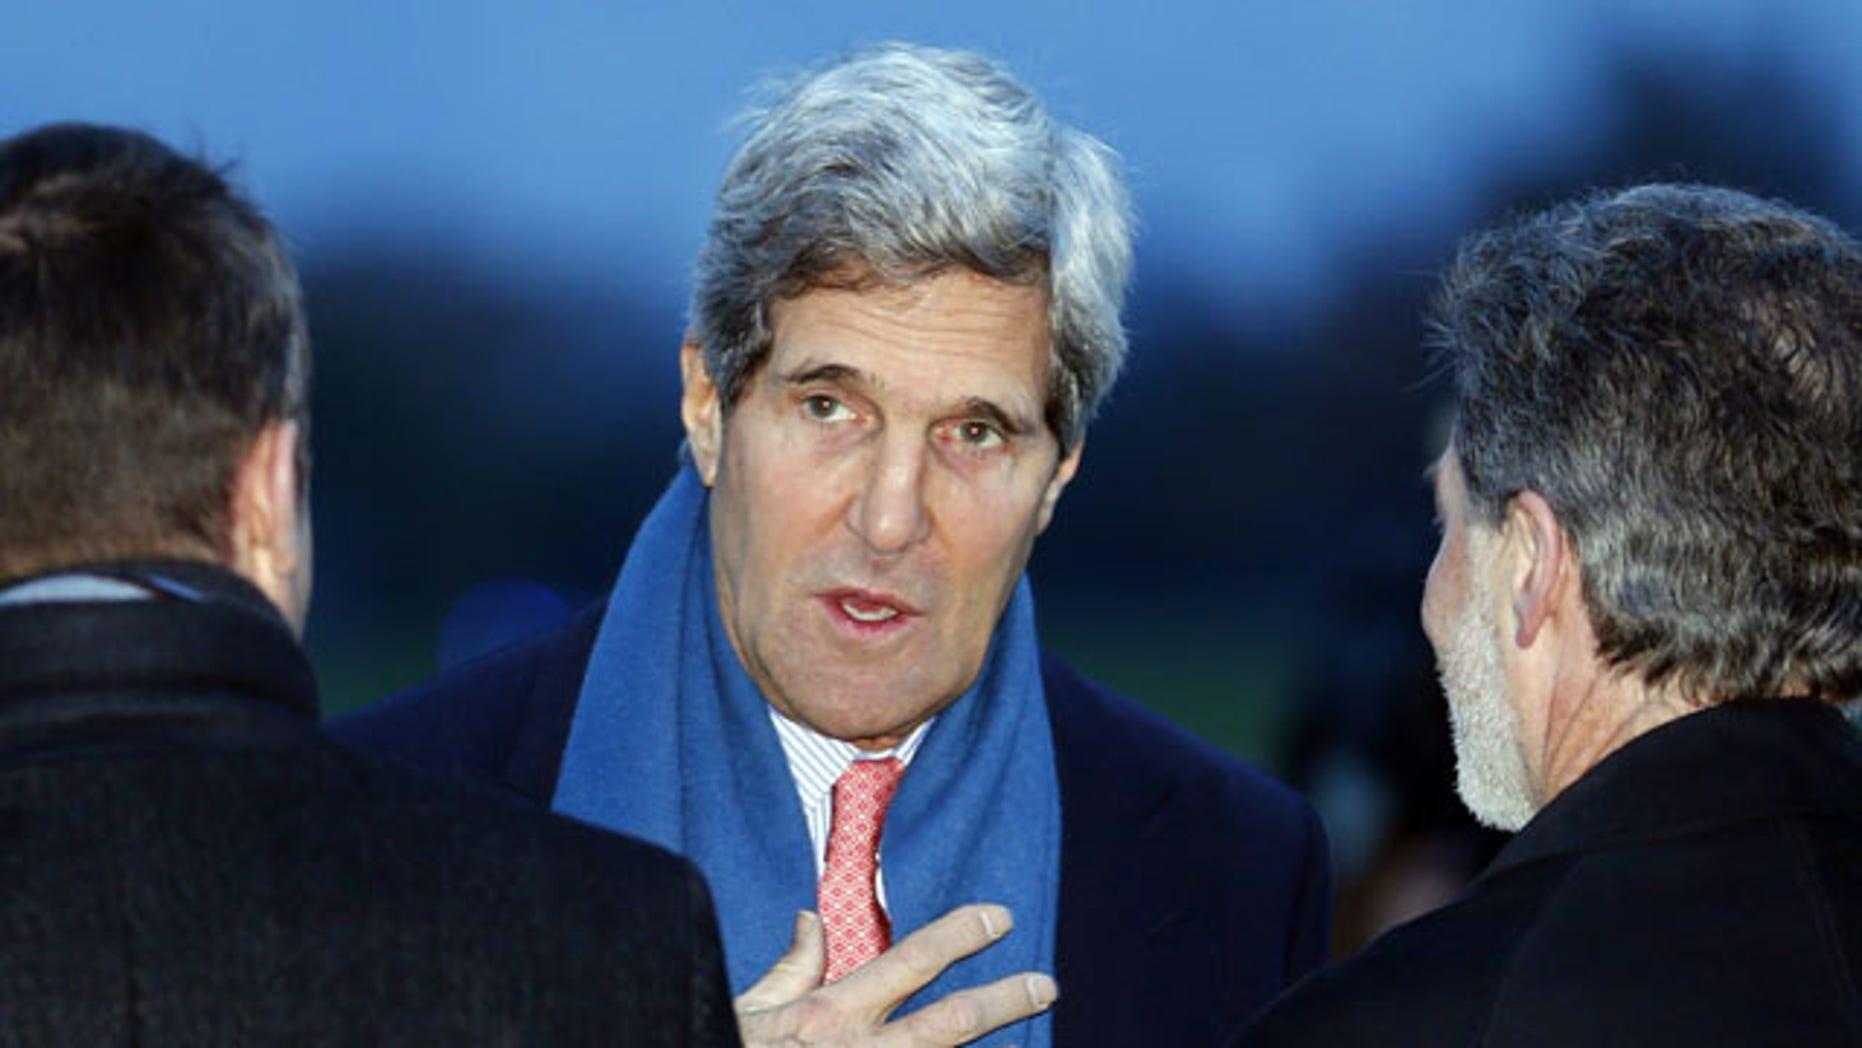 November 23, 2013: U.S. Secretary of State John Kerry arrives at Geneva International Airport in Geneva, Switzerland for the Iran nuclear talks. (AP Photo/Denis Balibouse Pool)